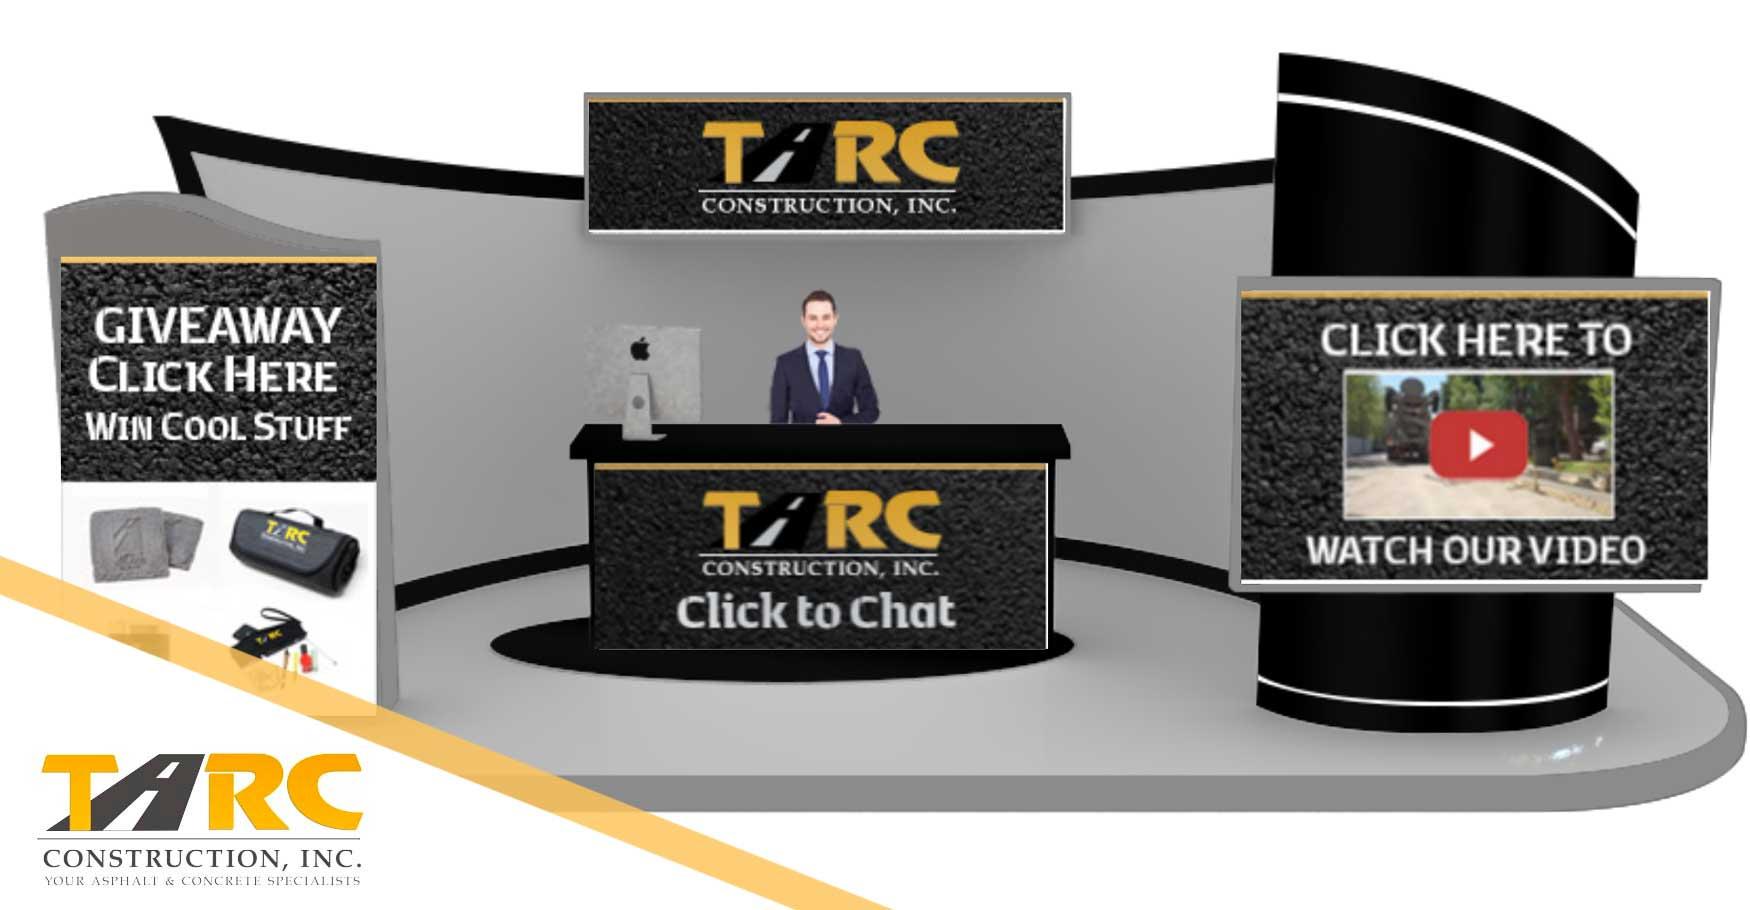 Tarc Construction